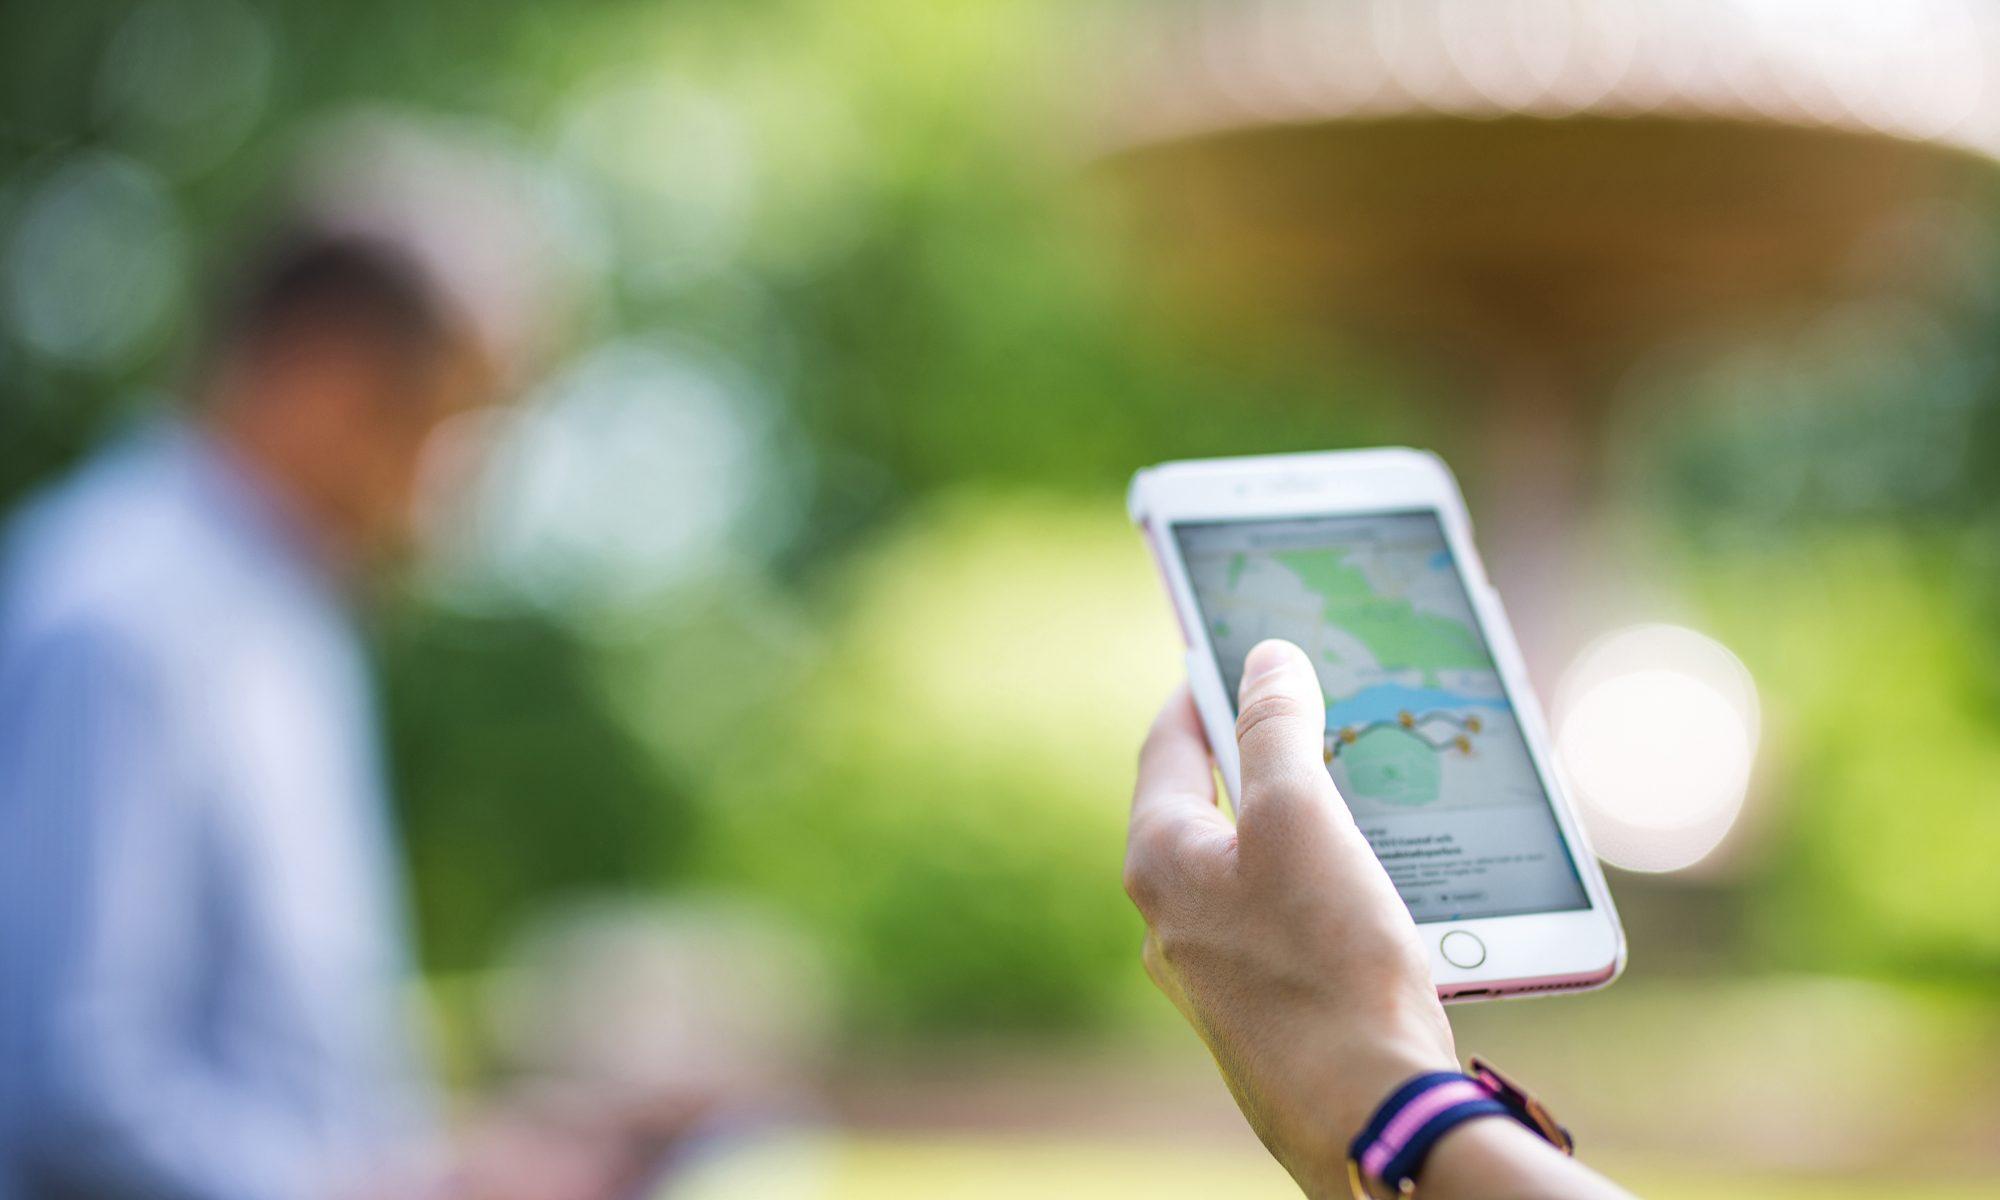 Royal Walks – New app for Royal Djurgården